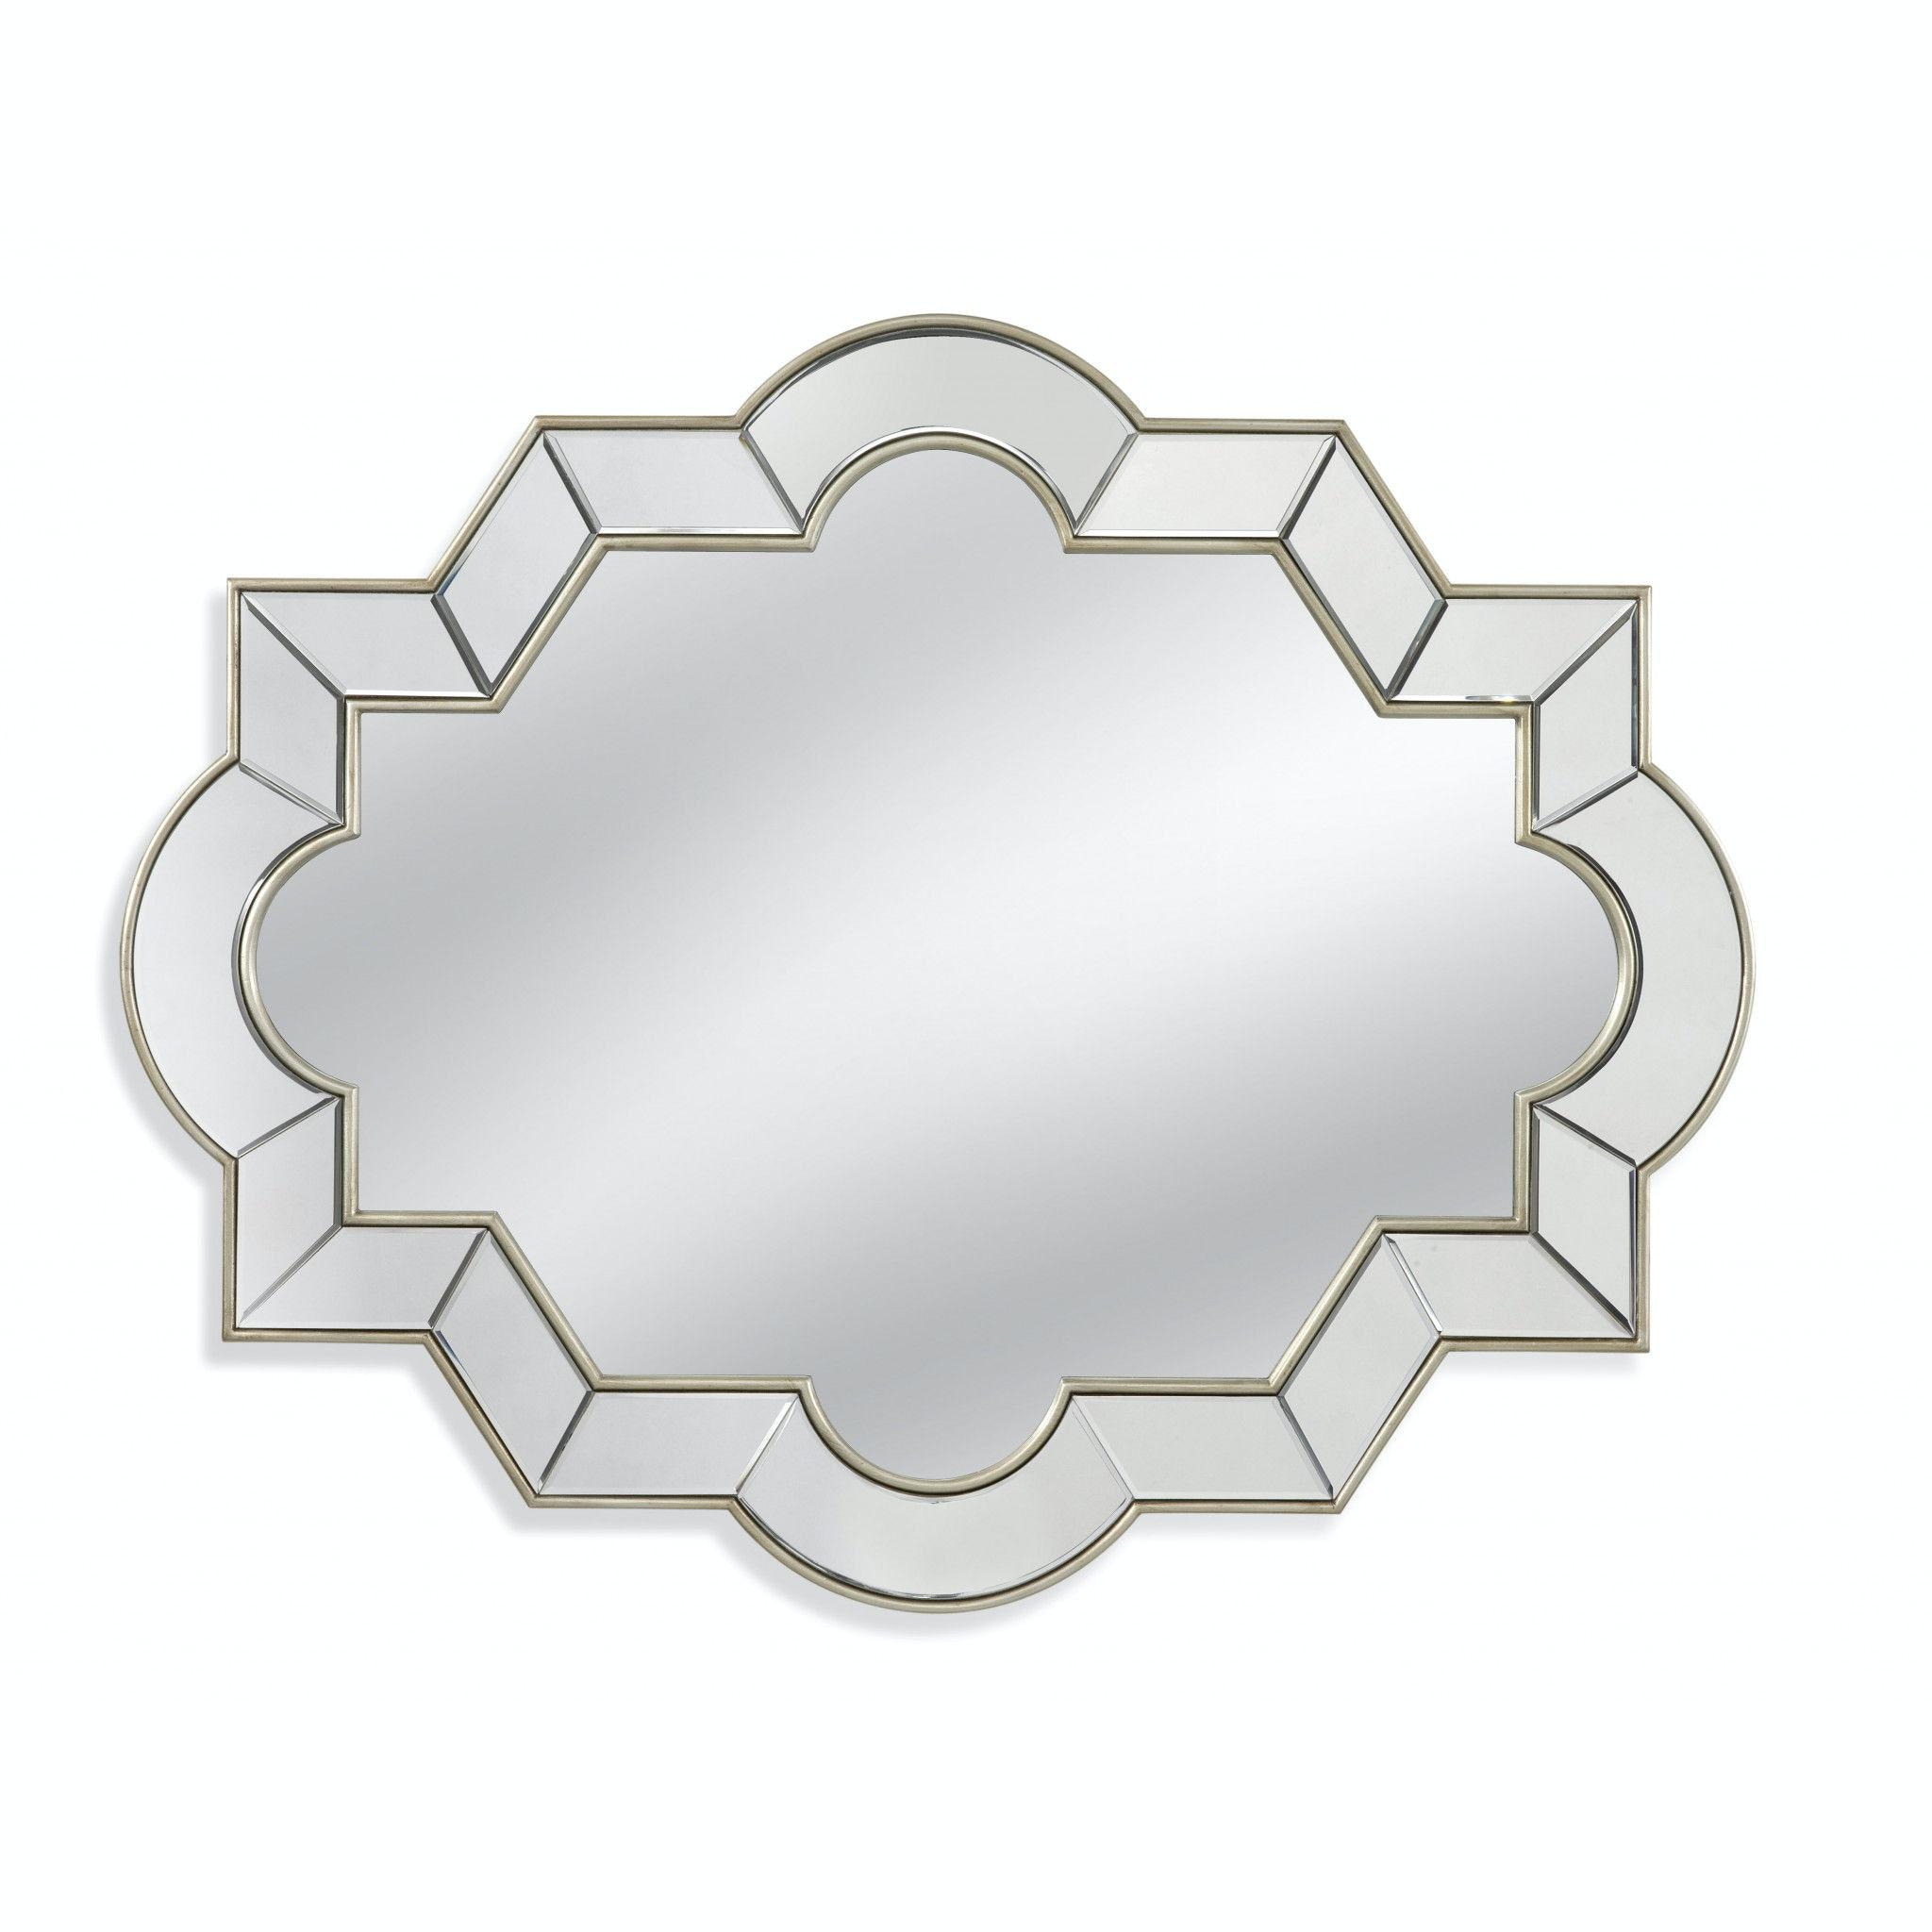 Bassett Mirror Company Azusa Wall Mirror M3859